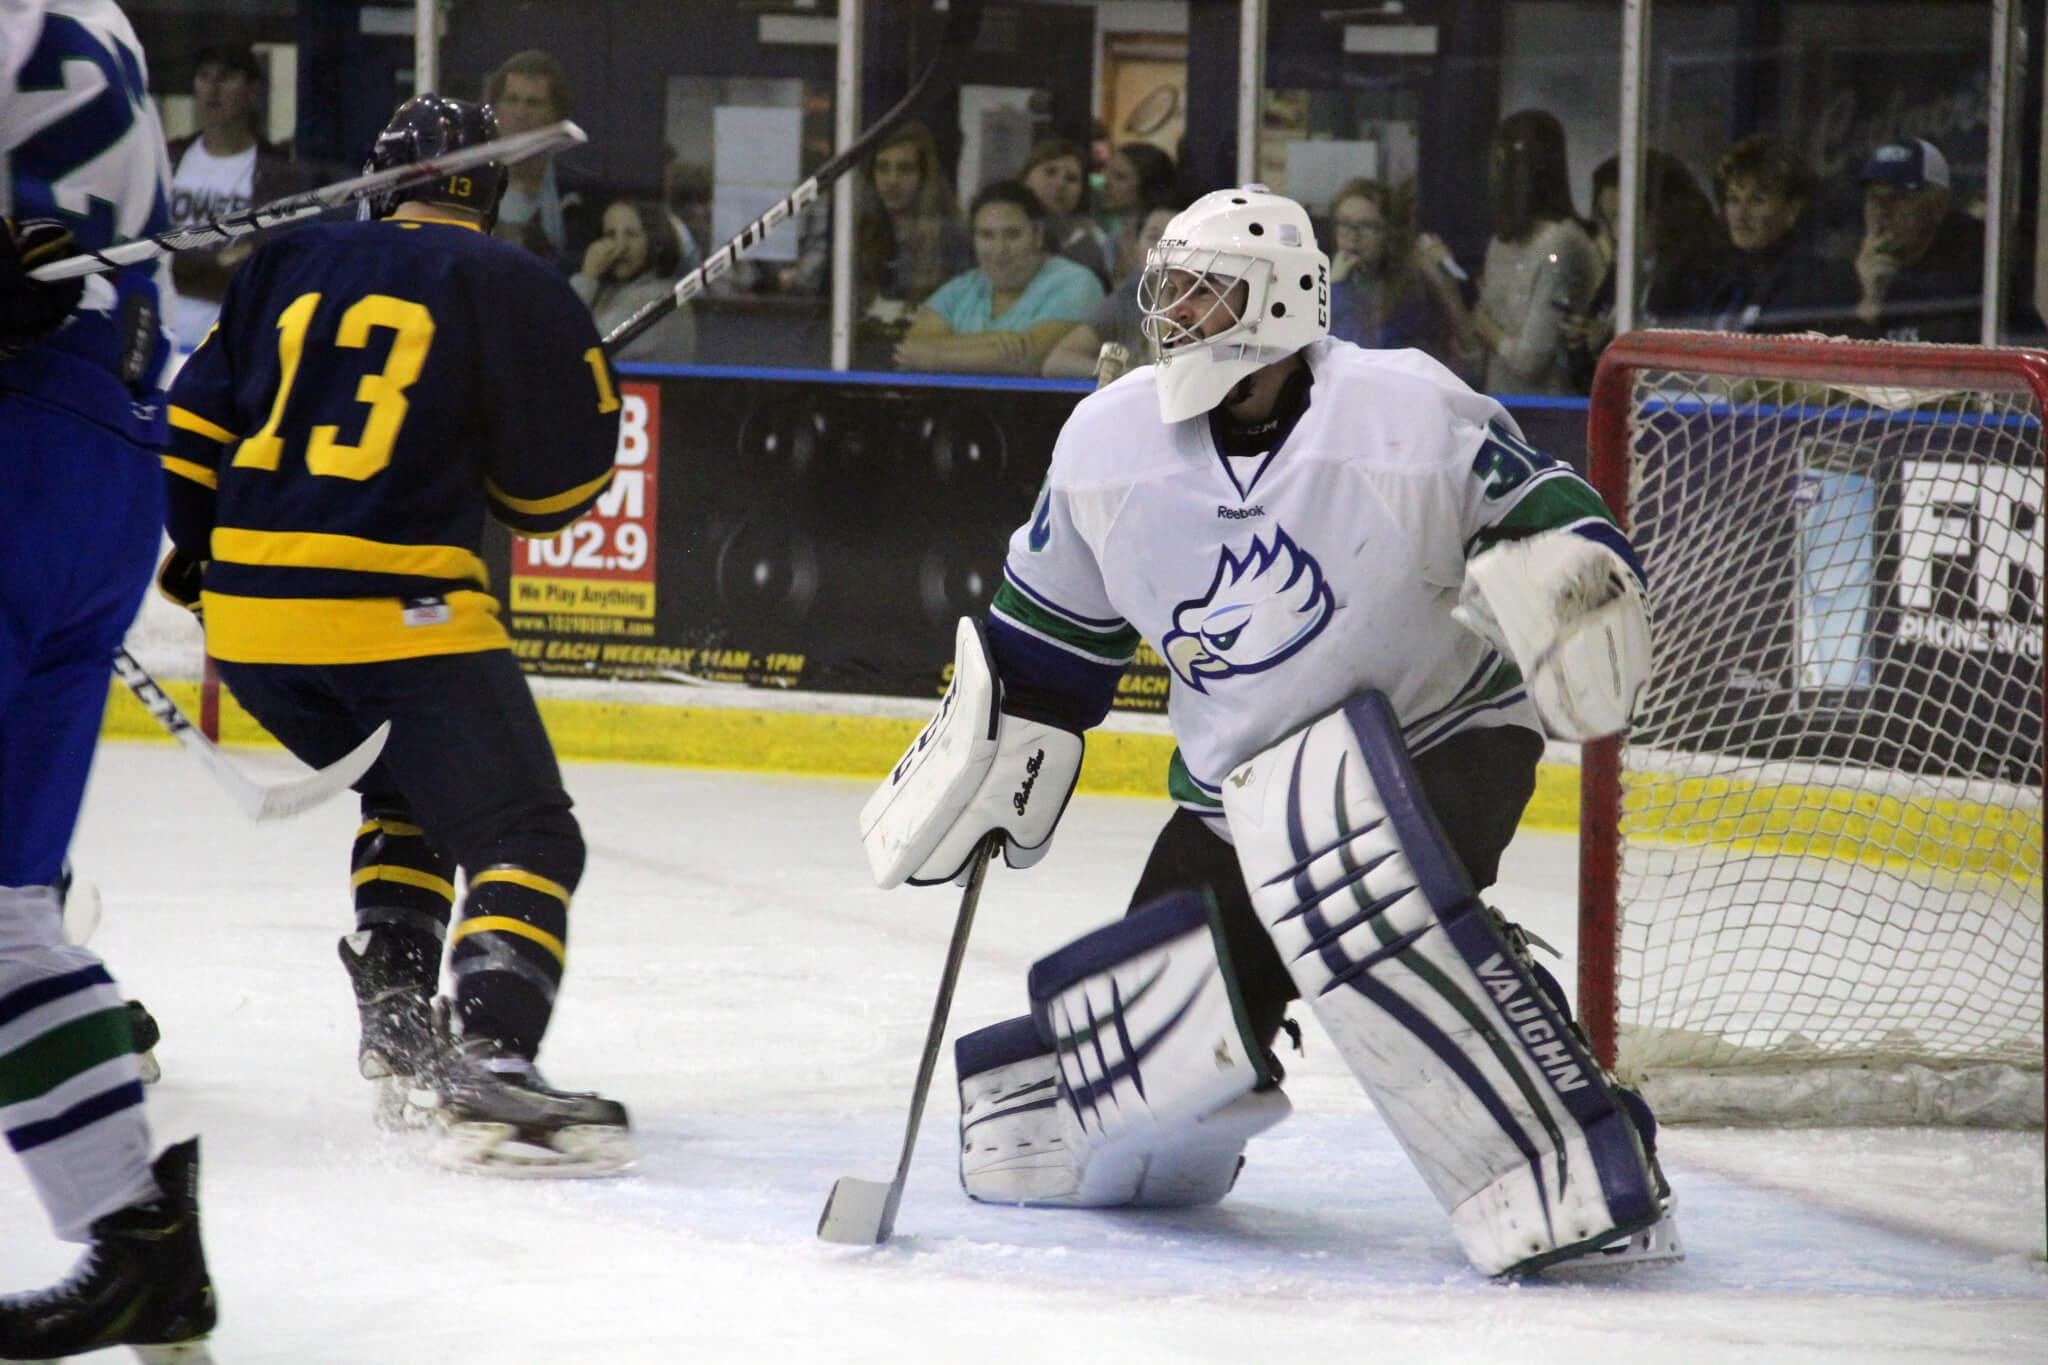 FGCU DII hockey completes weekend sweep of Holy Cross